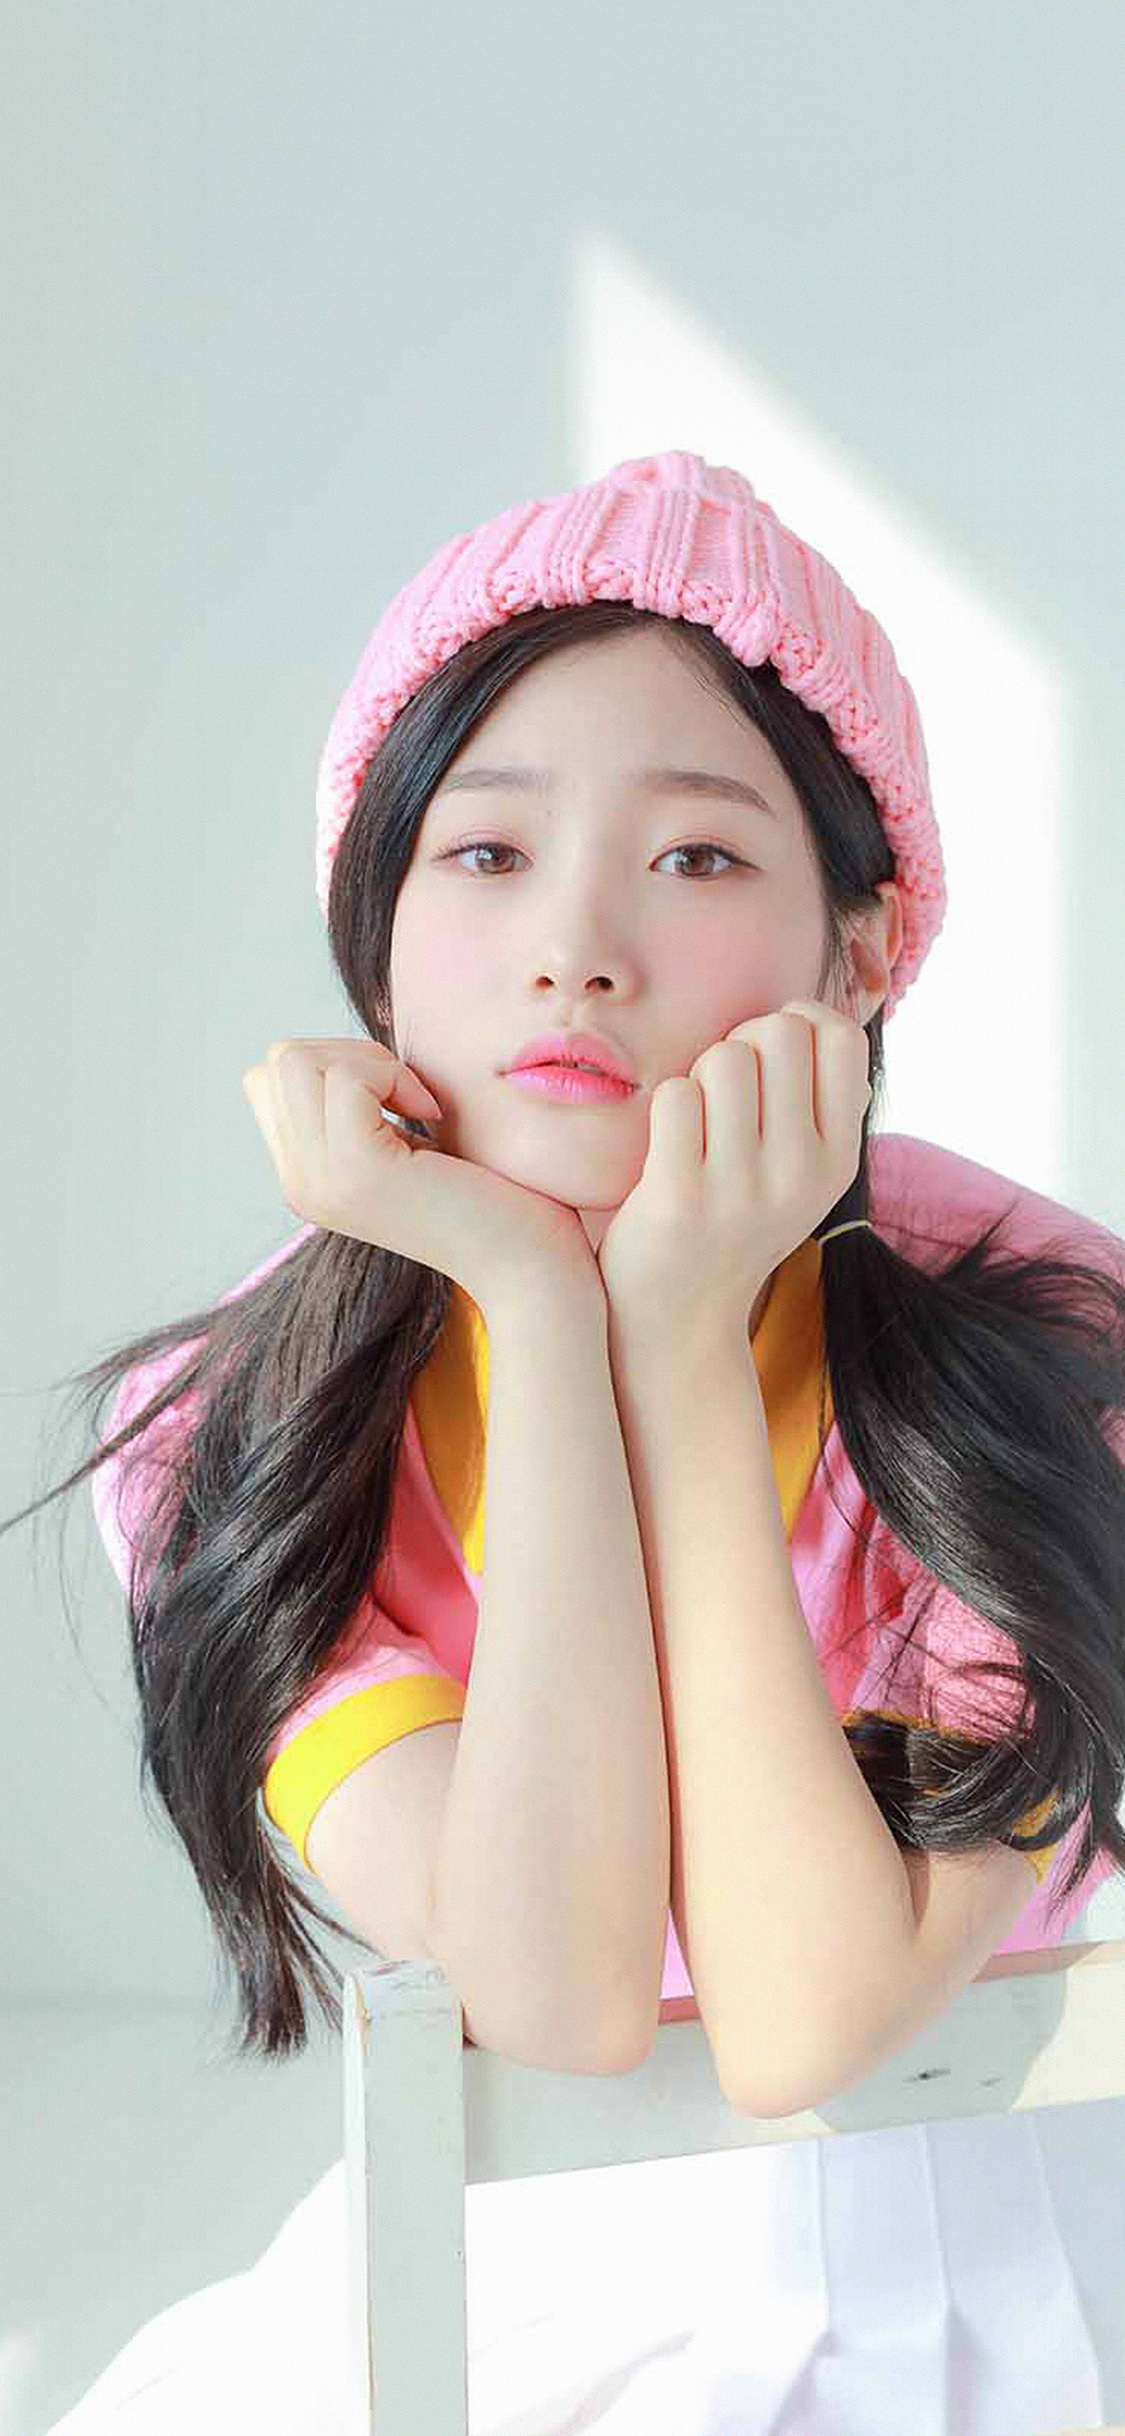 I Am A Simple Girl Wallpaper Hm45 Ioi Chaeyeon Girl Pink White Asian Wallpaper